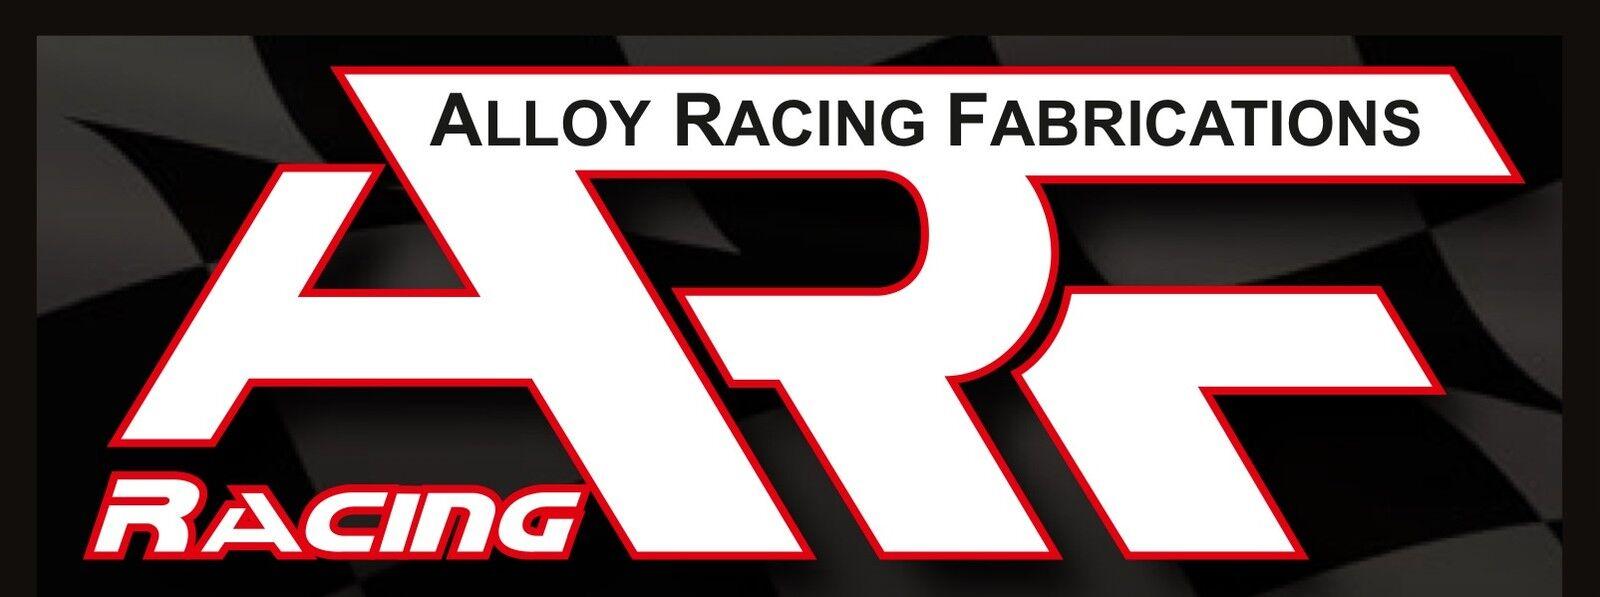 Alloy Racing Fabrications